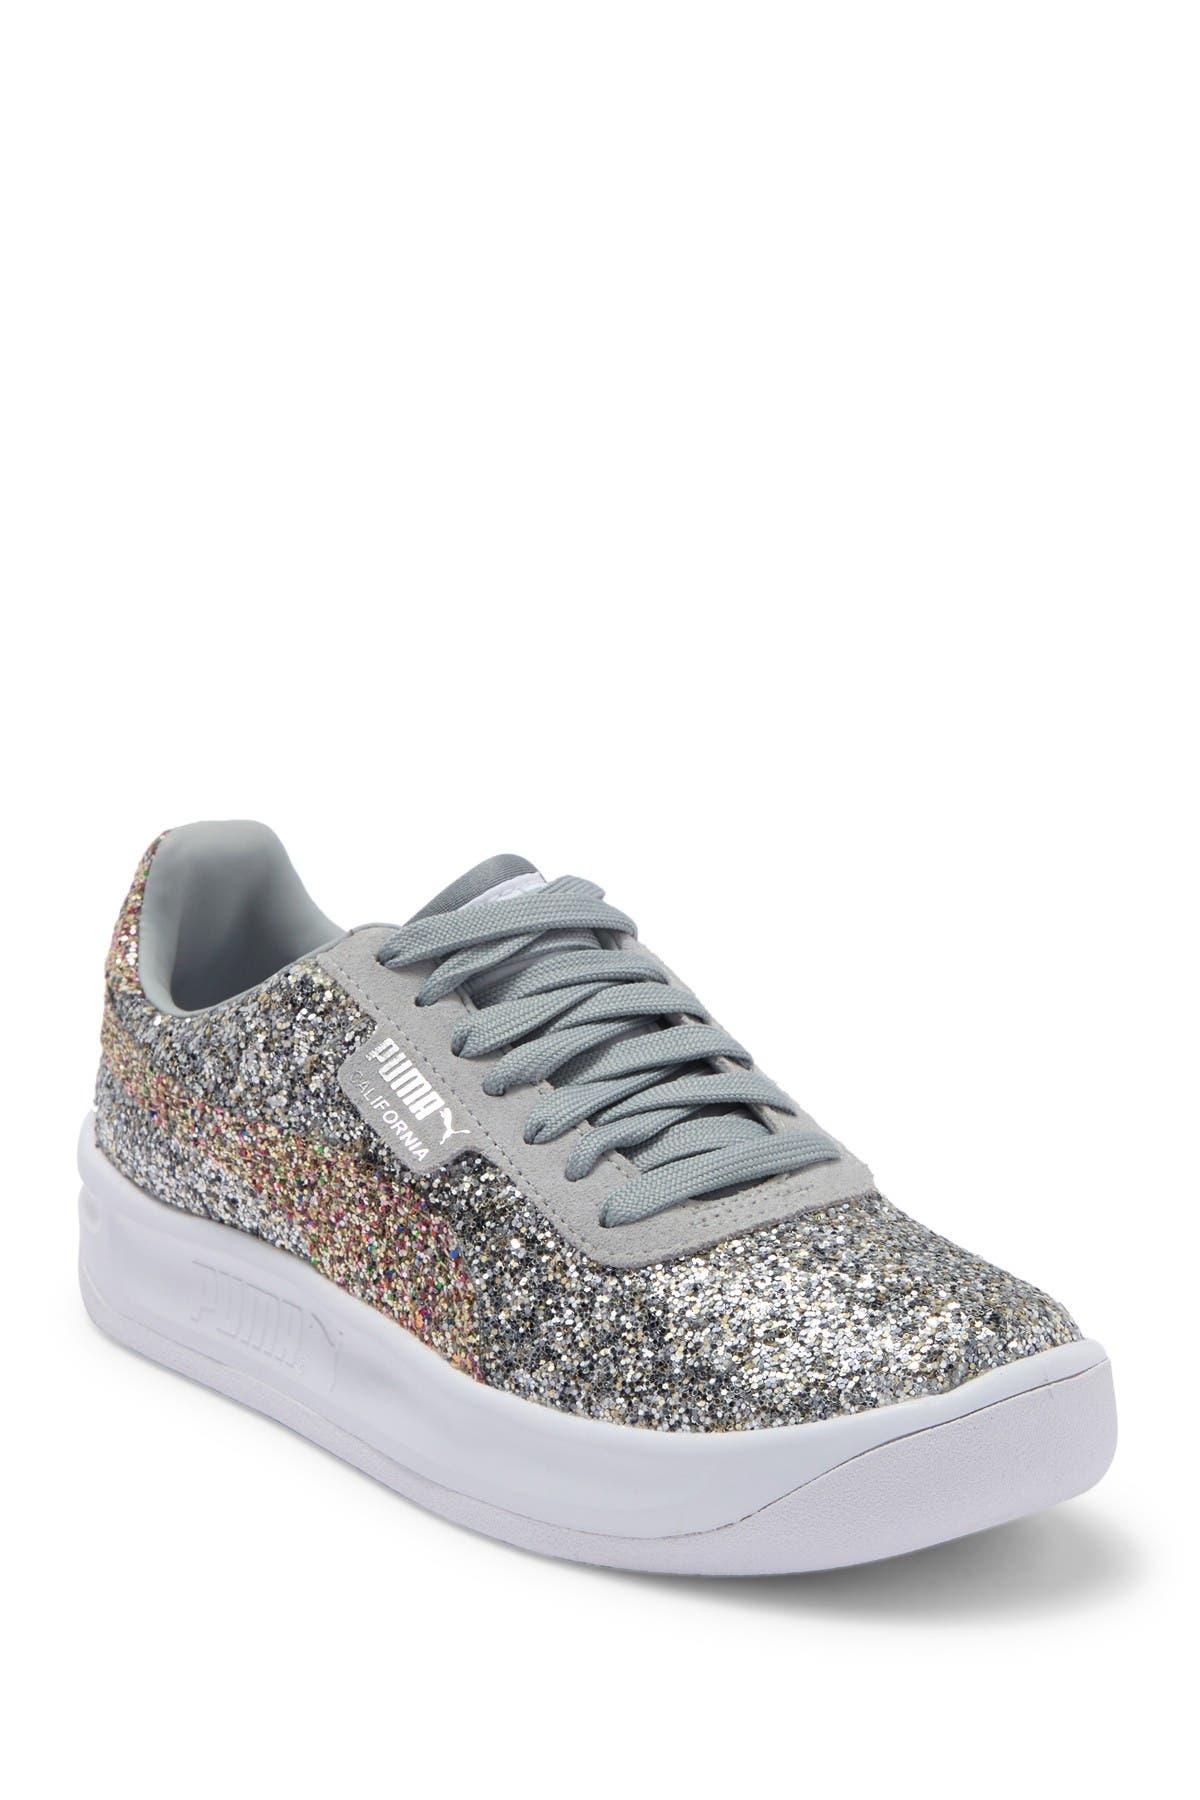 PUMA   California Glitz Glitter Sneaker